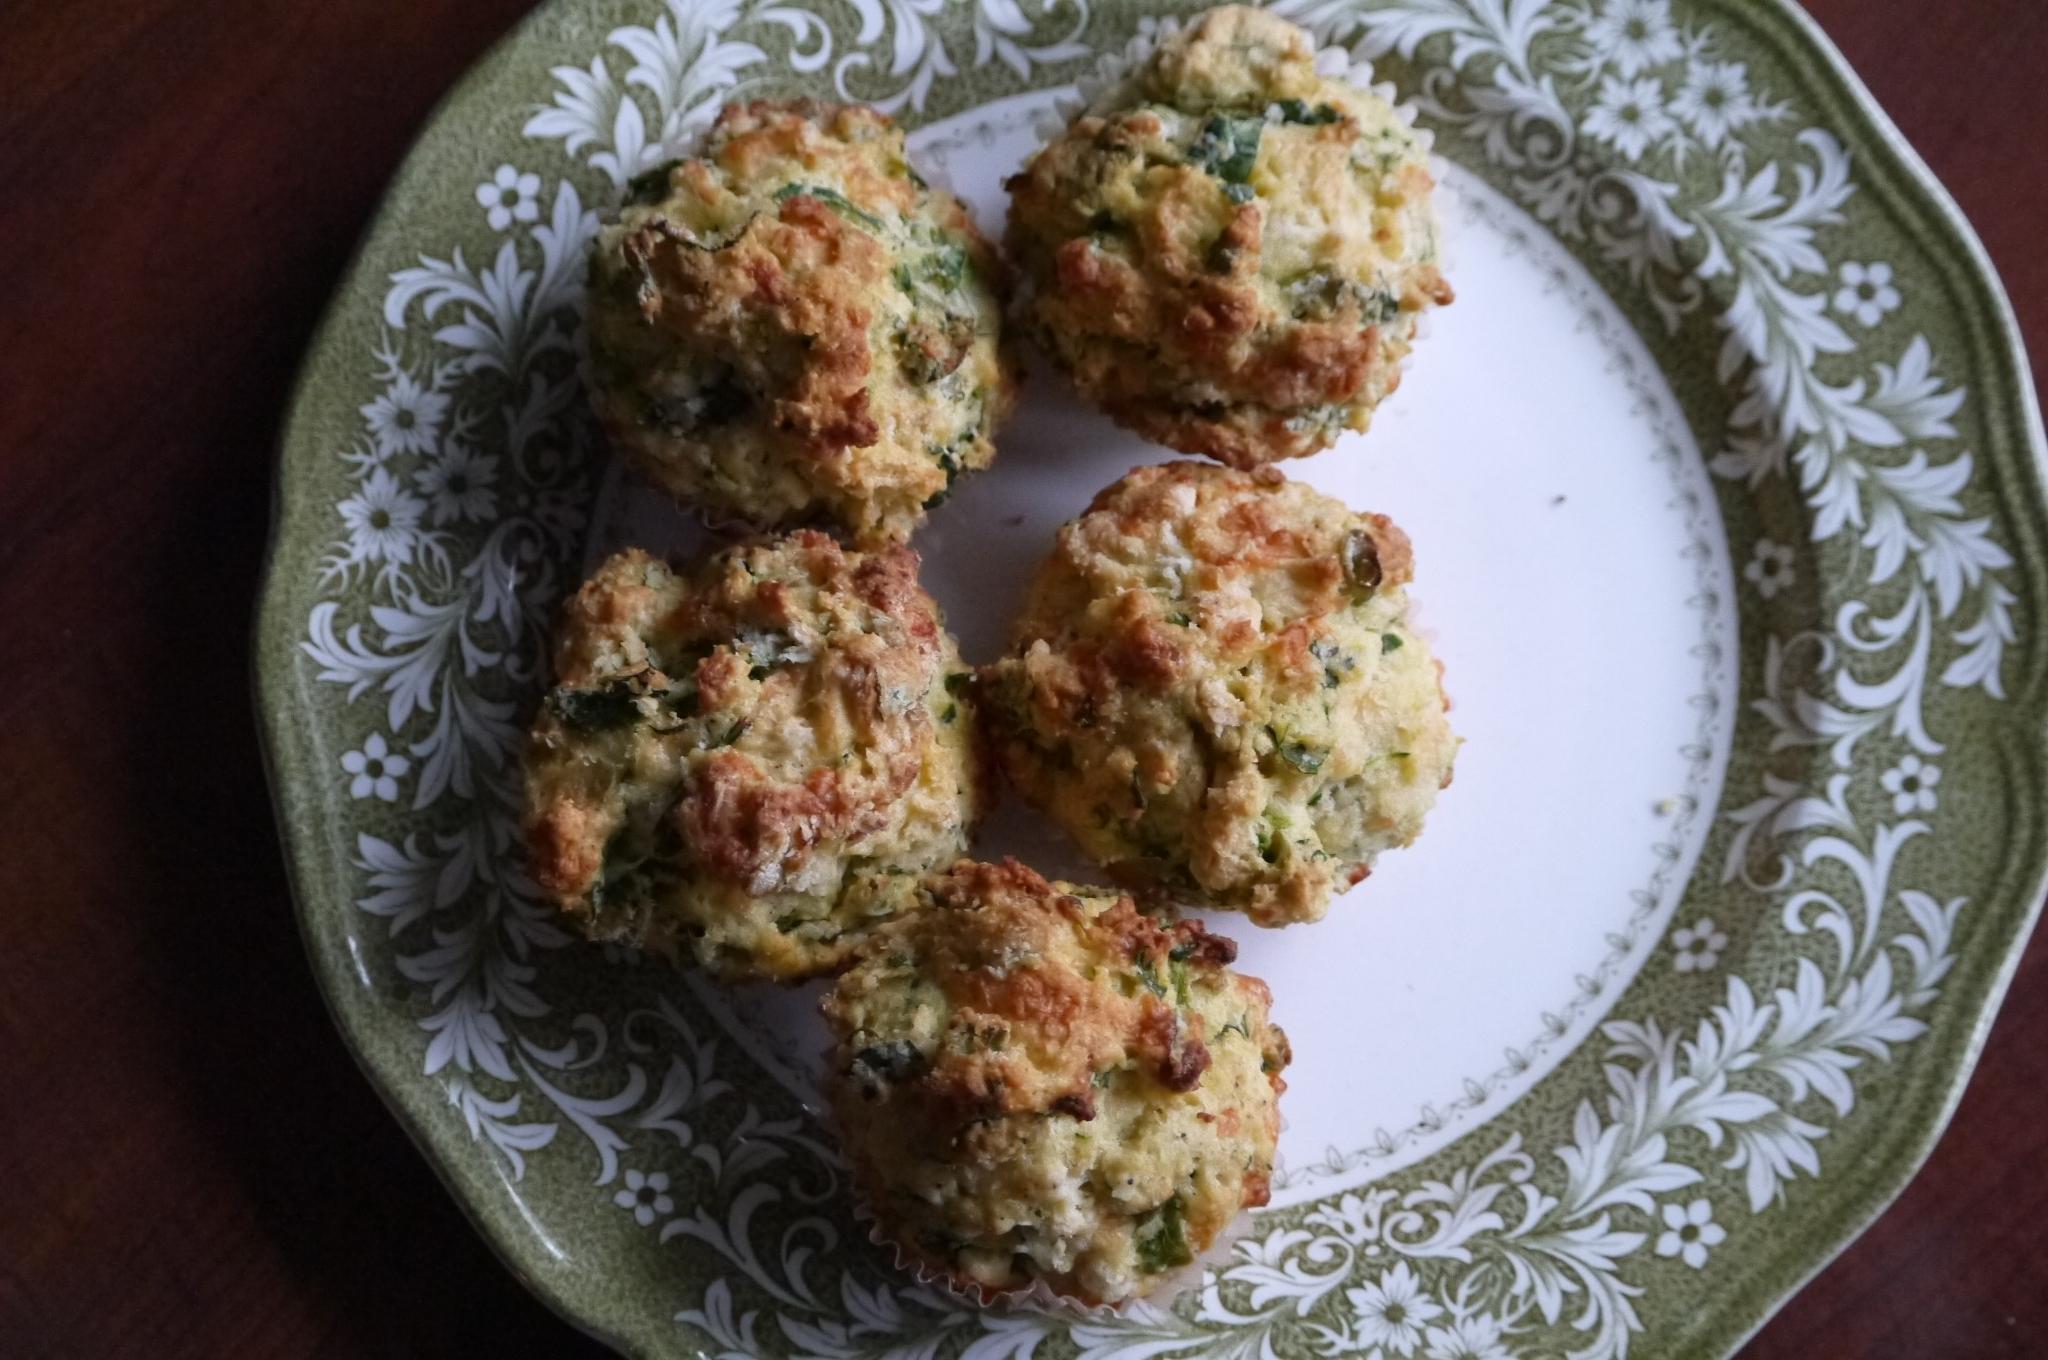 savoury cheddar muffins - trustinkim.com